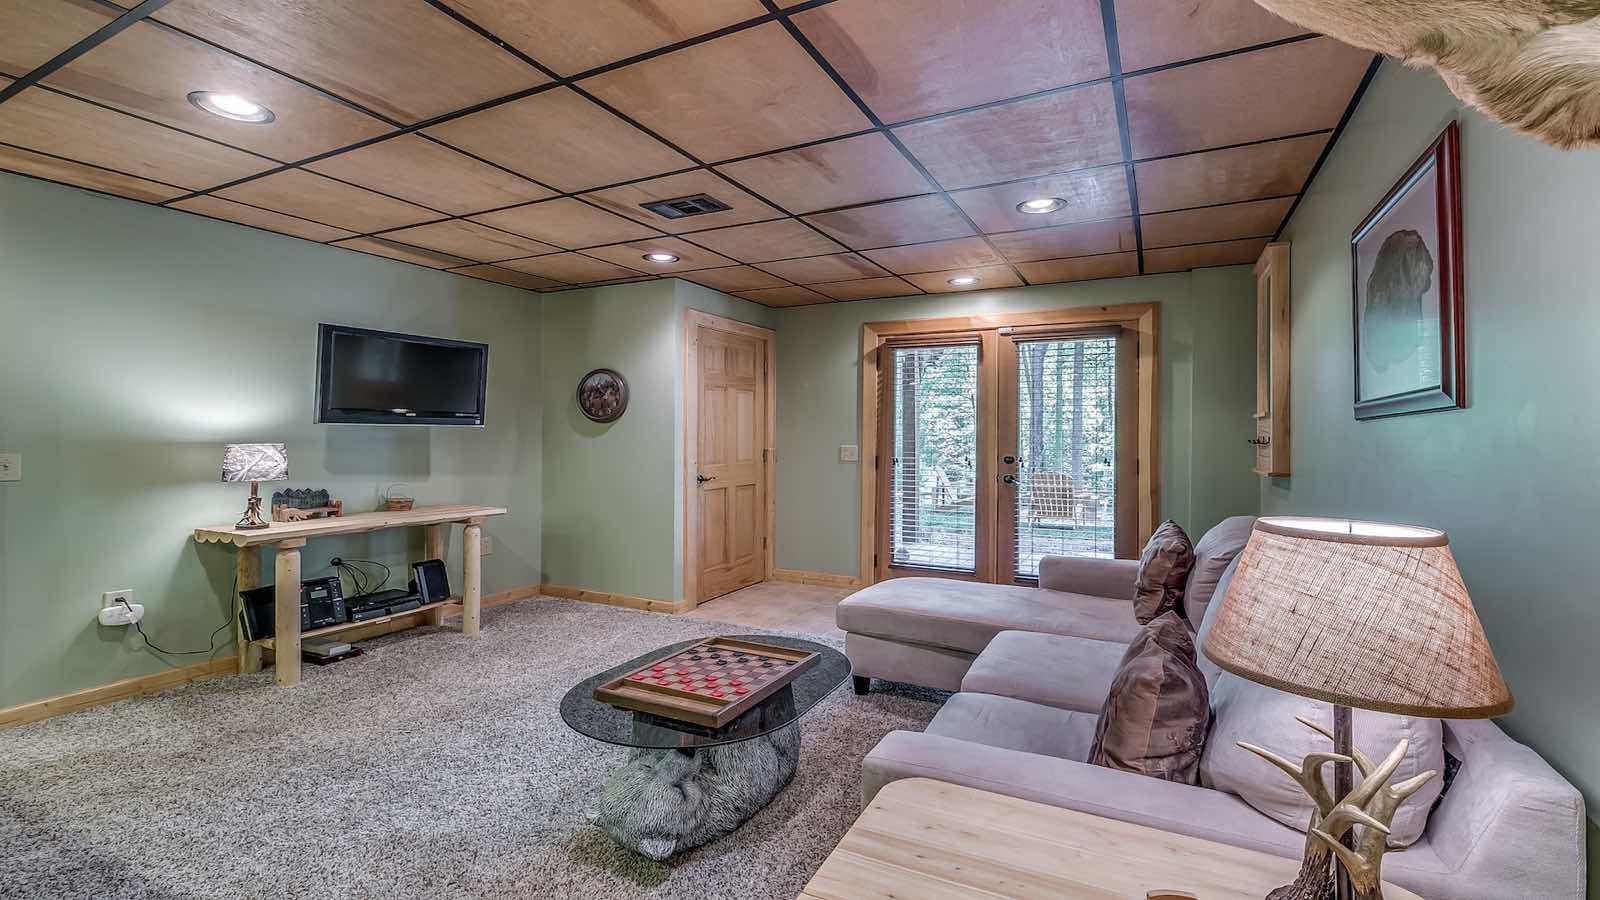 Tucked Away Rental Cabin Blue Ridge Ga